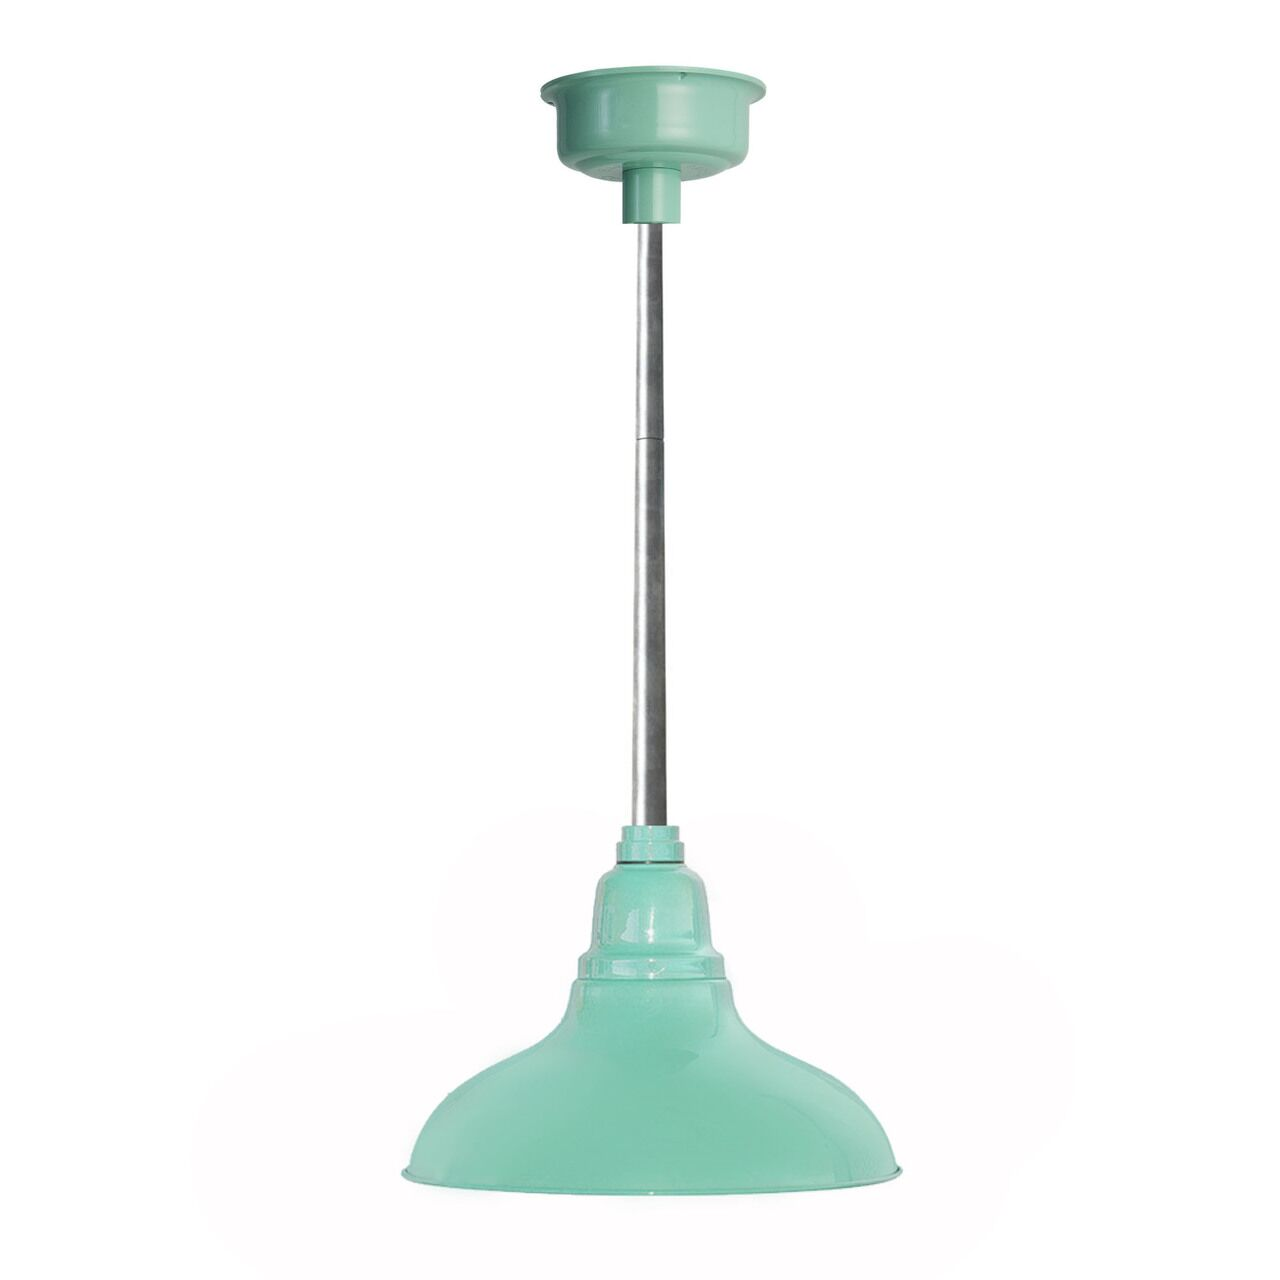 Idella 1-Light  LED Dome Pendant Finish: Jade with Galvanized Silver Downrod, Size: 9